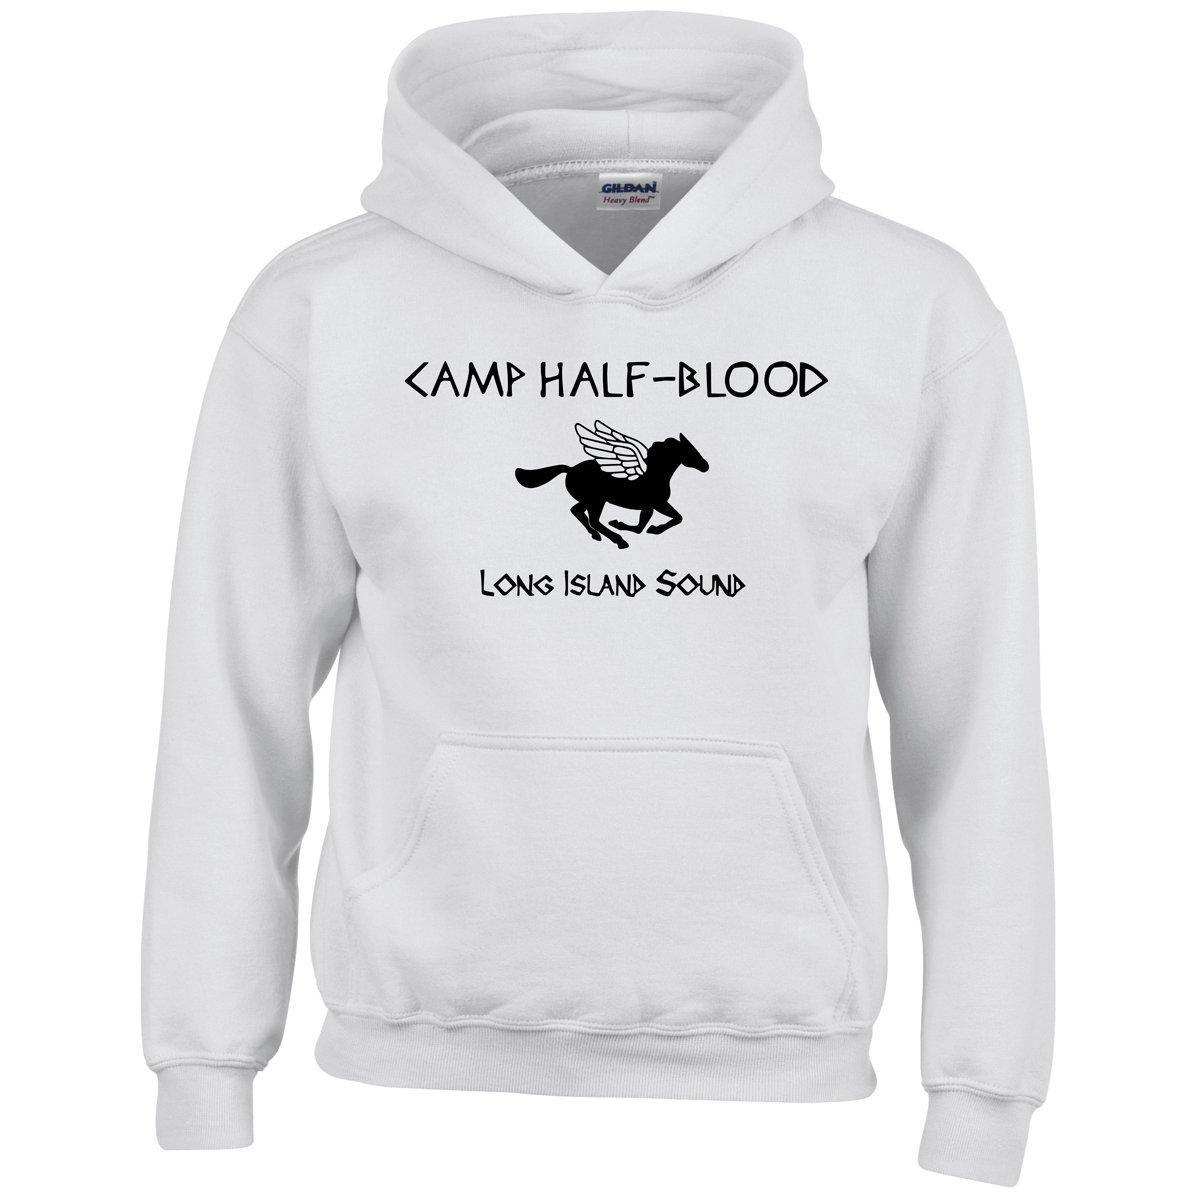 Camp Half Blood Inspired Percy Jackson World Book Day Boys Hoodies Long Island Sound